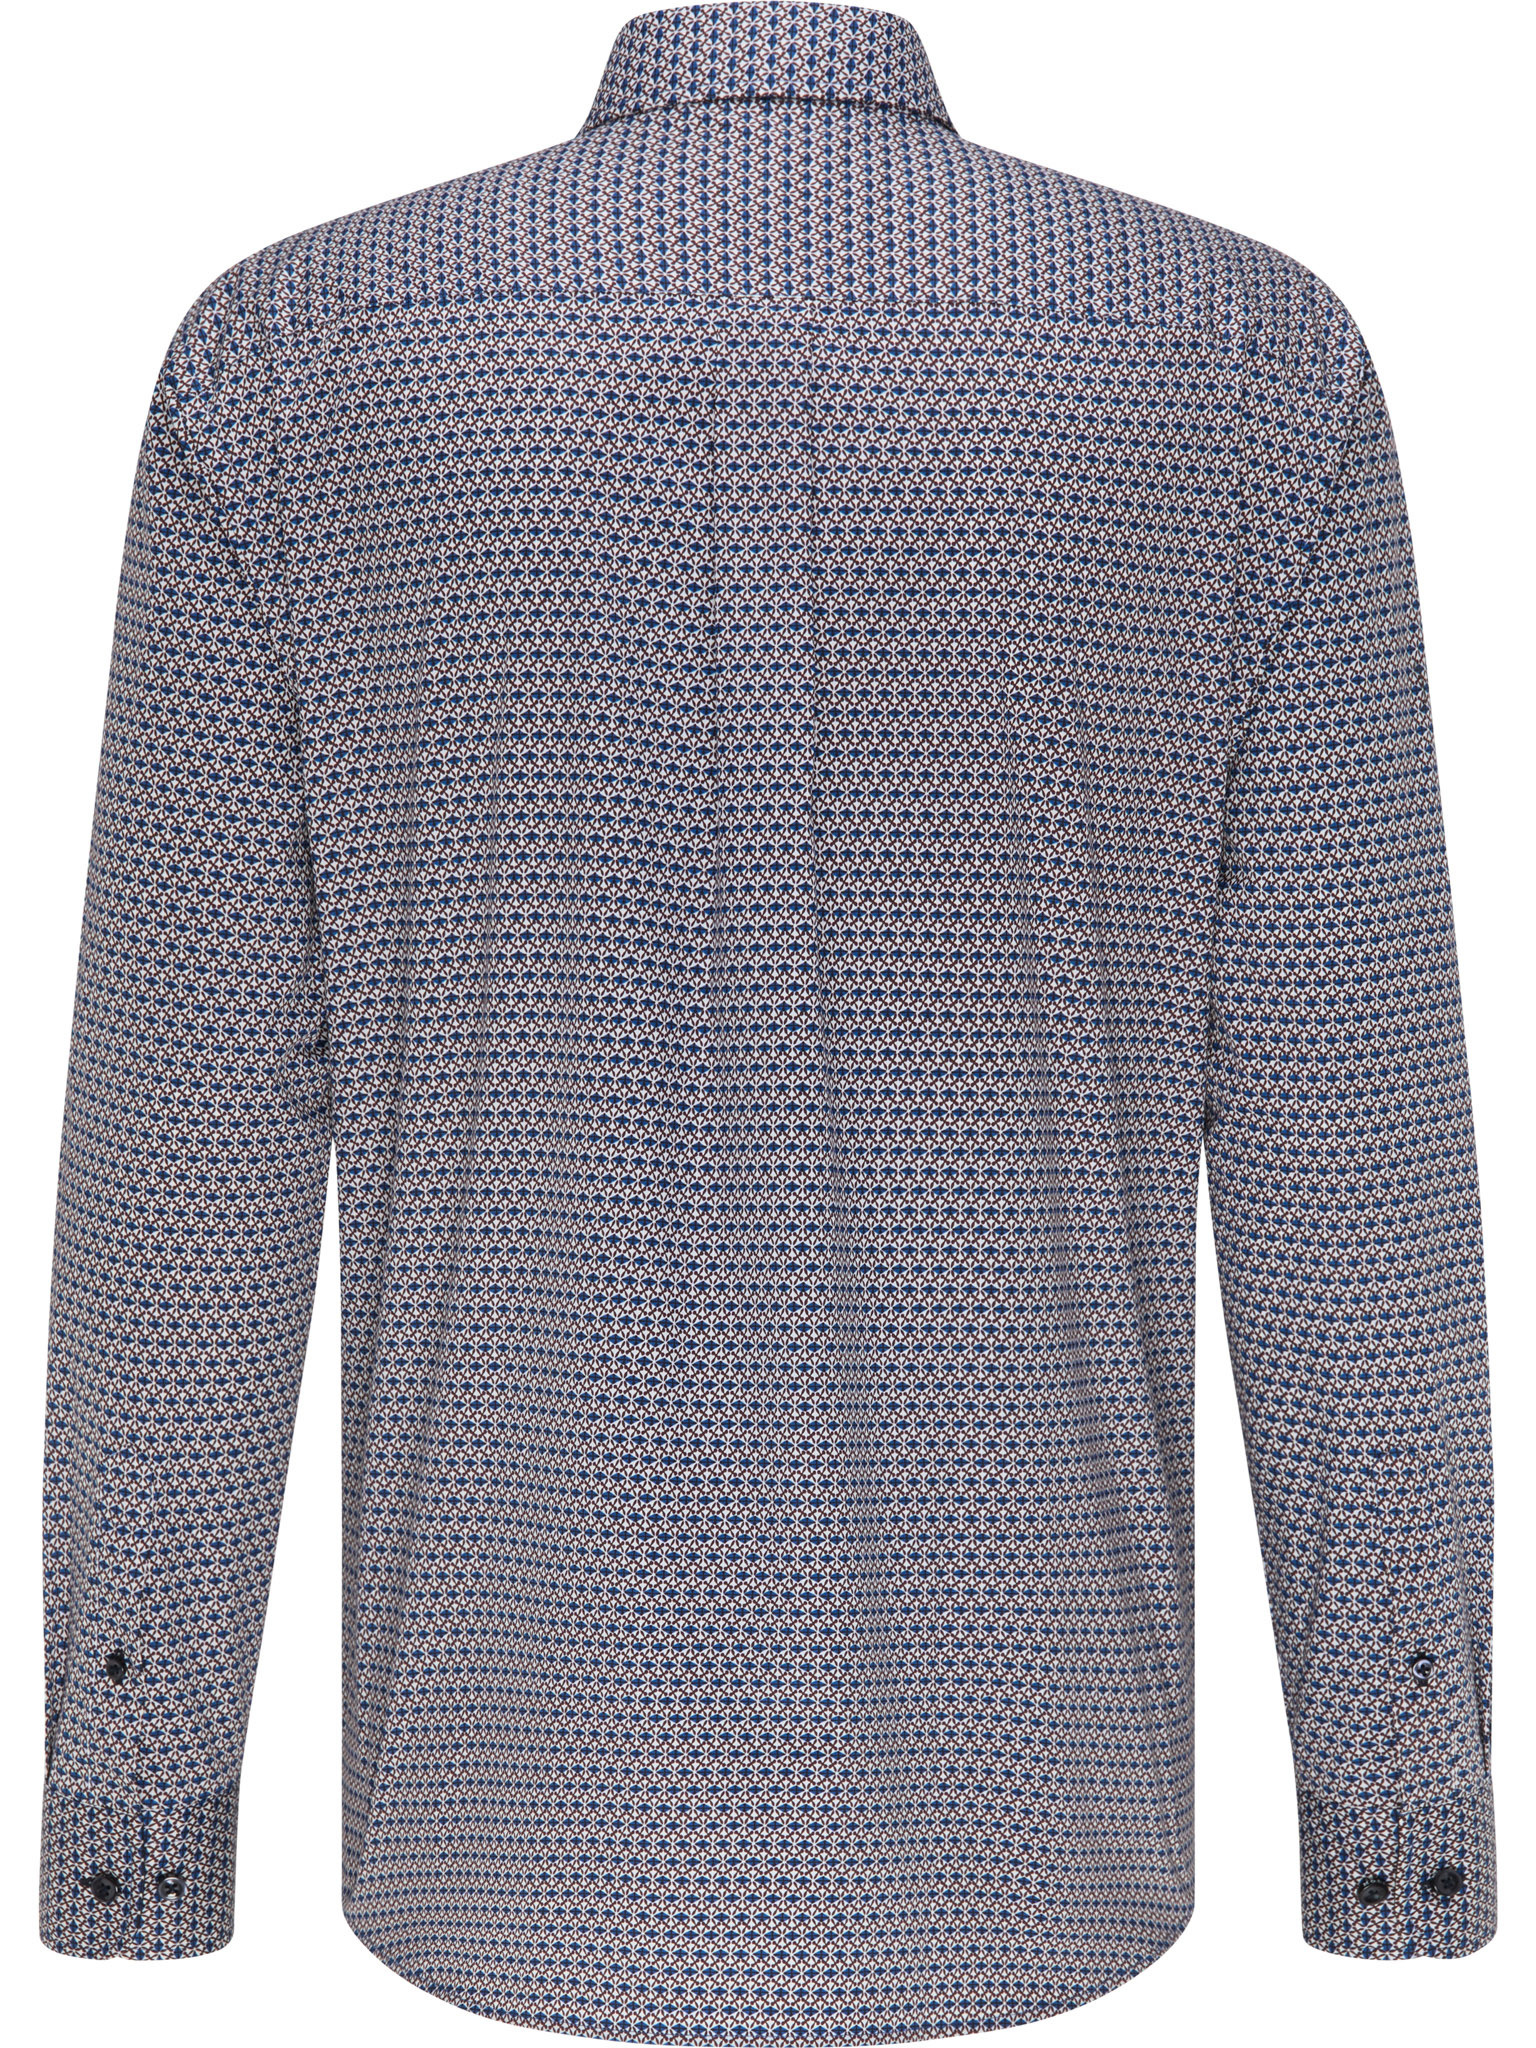 FYNCH HATTON chemise merlot blue print-2